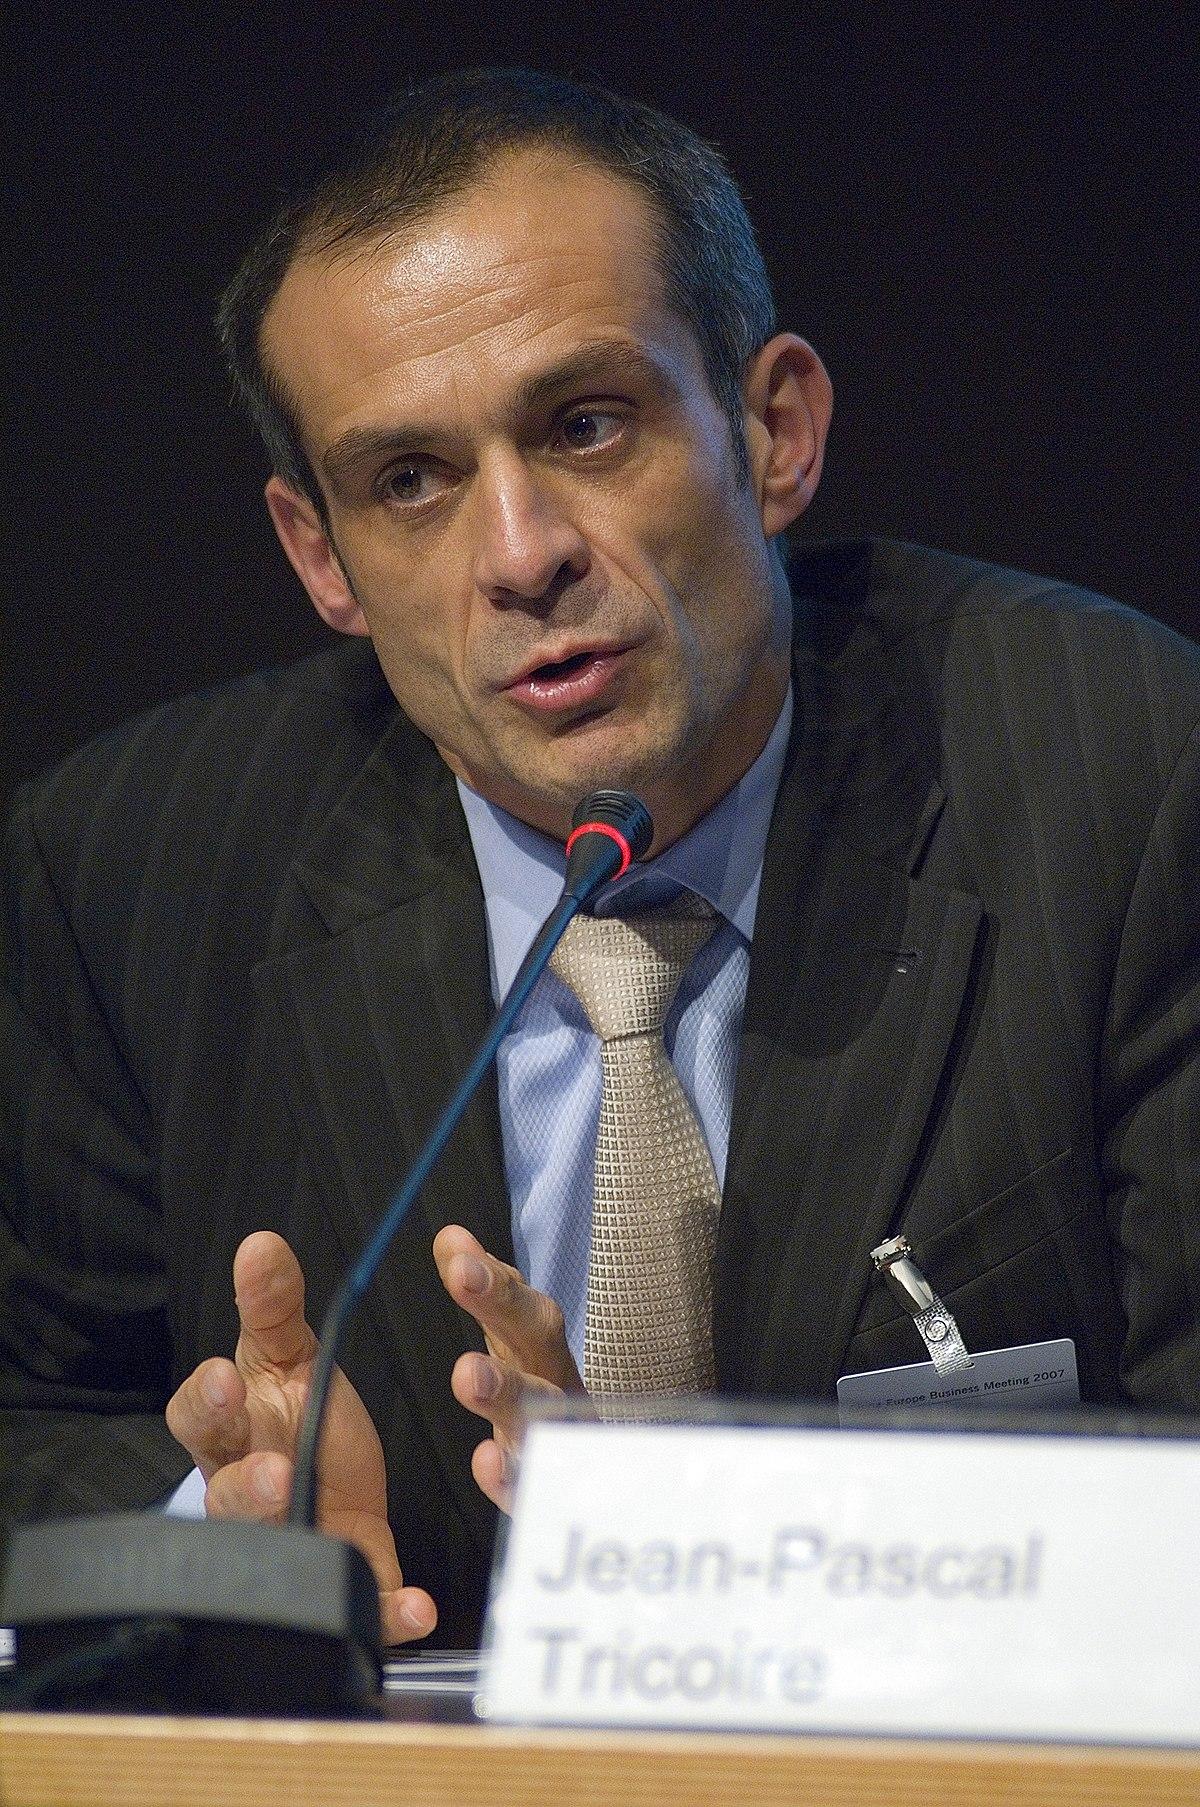 Jean-Pascal Tricoire - Wikipedia